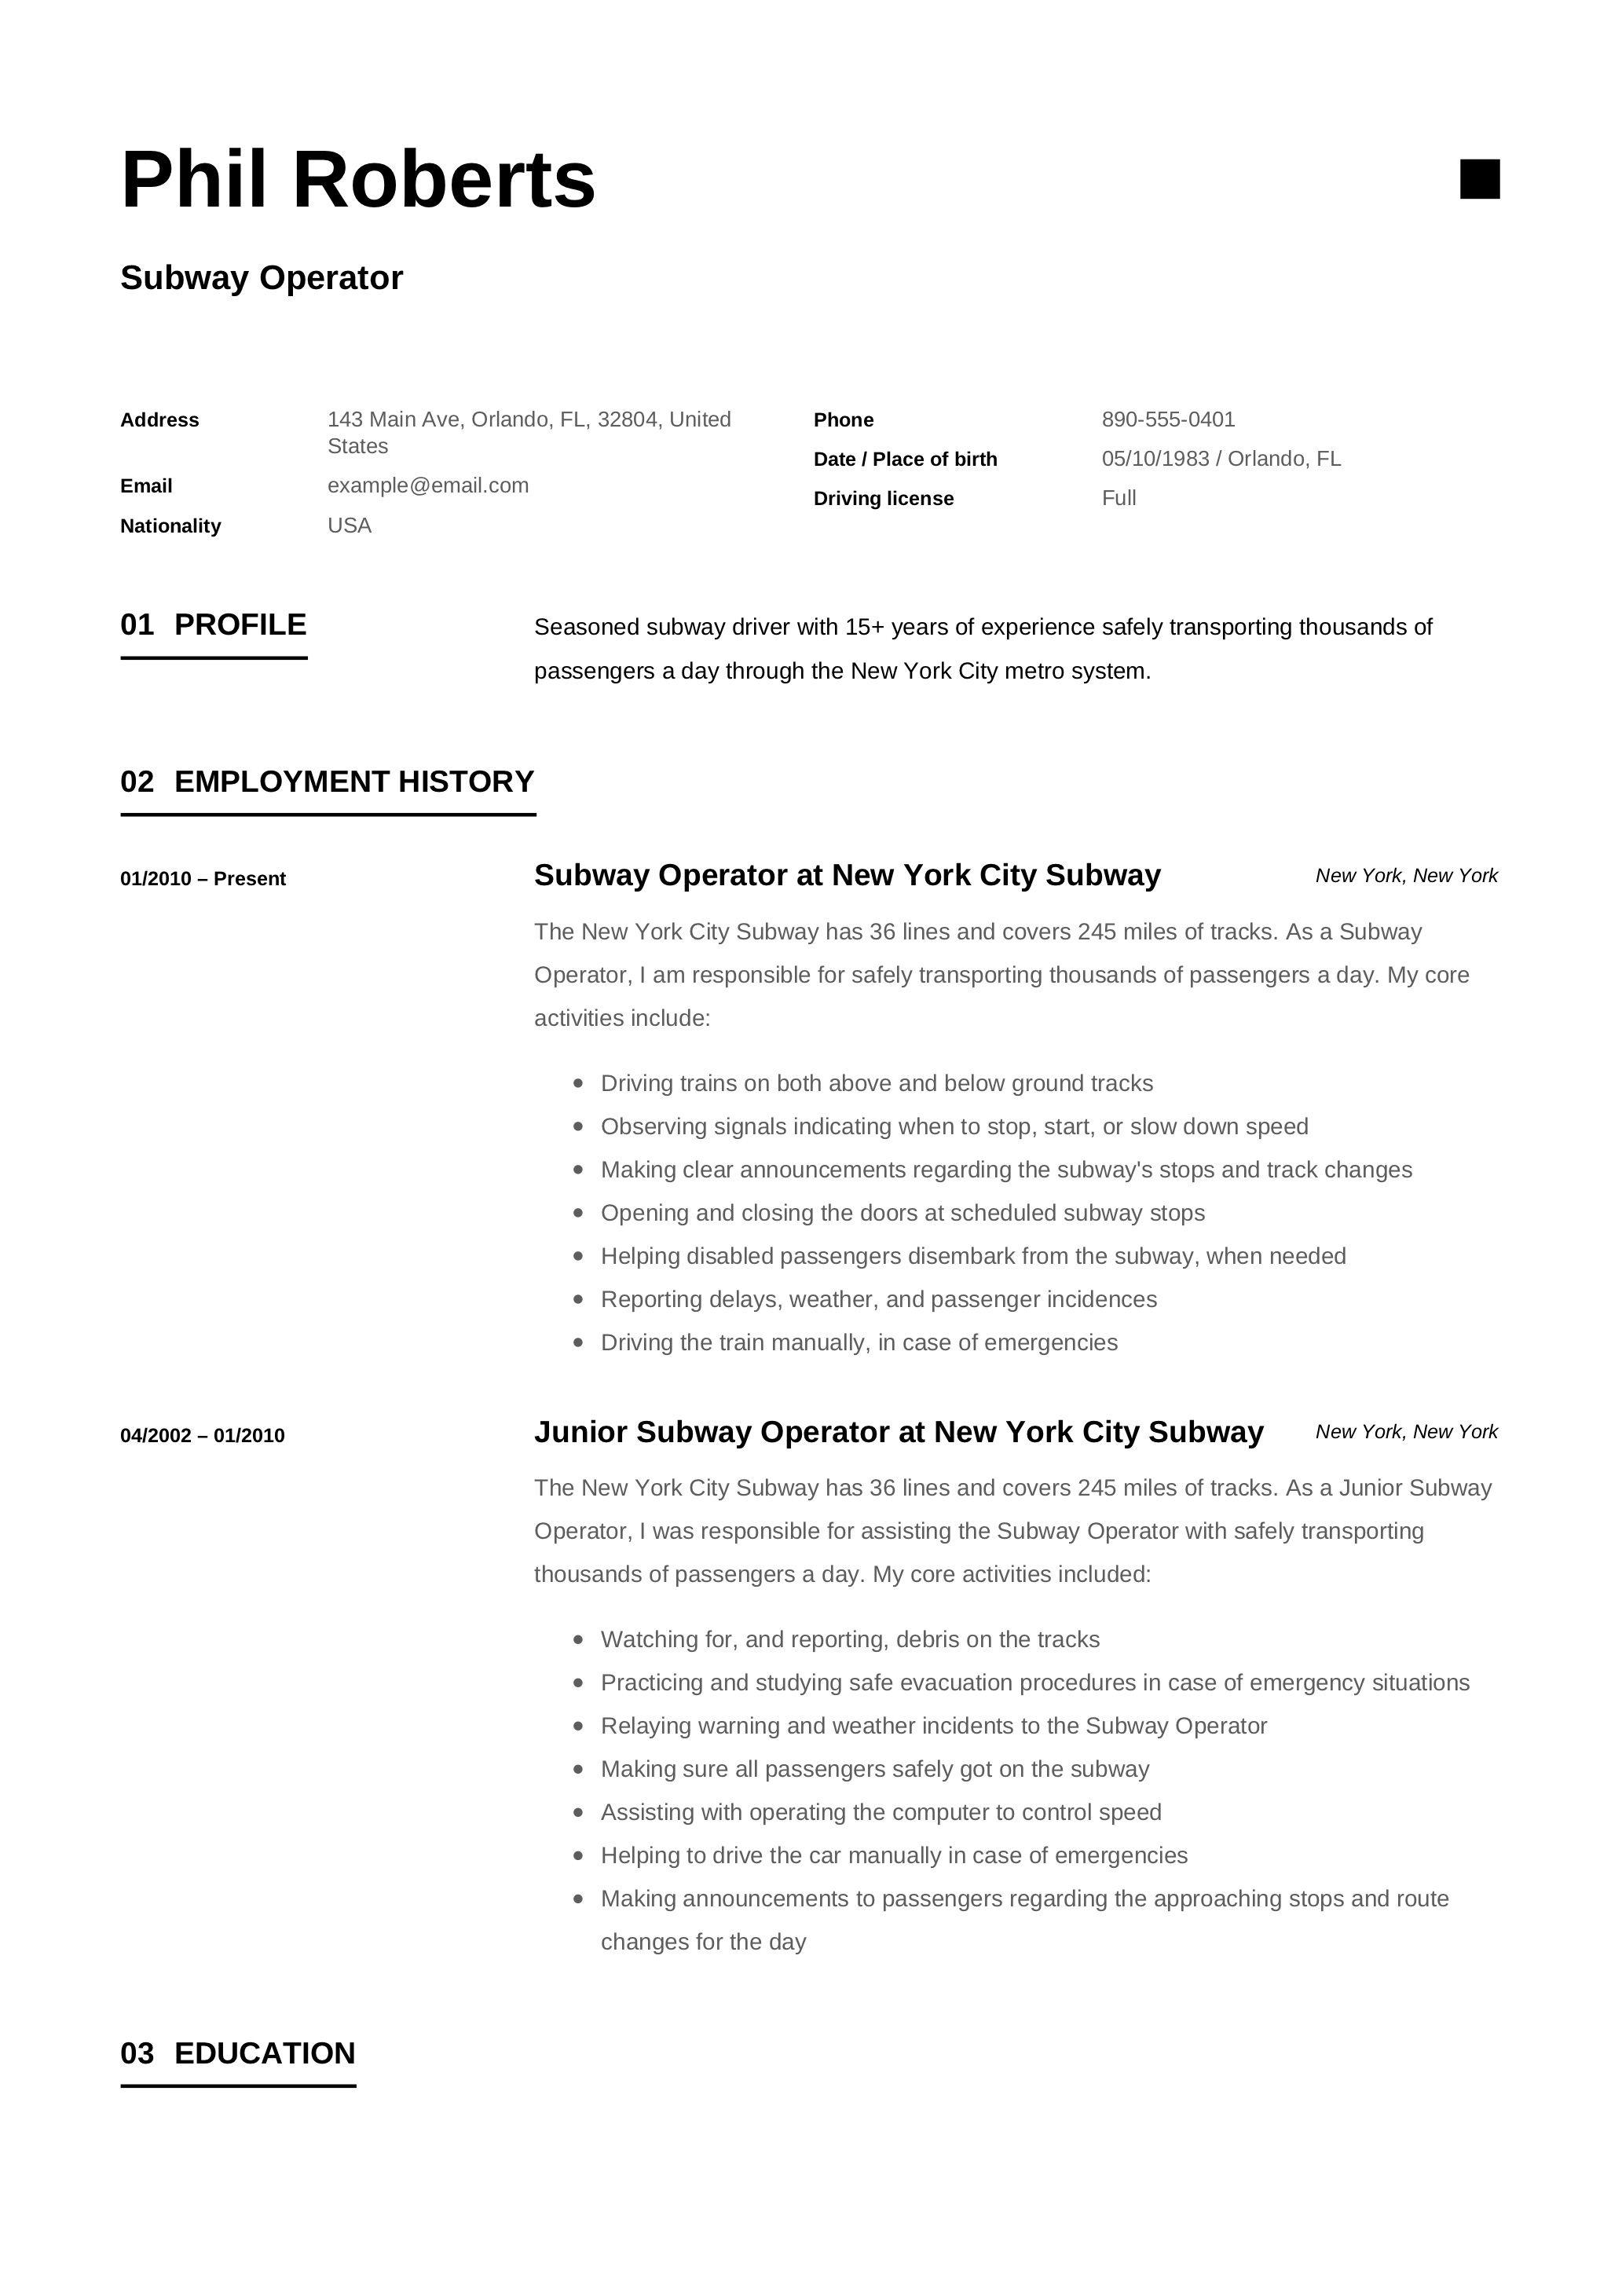 Subway Operator Resume Template Resume Examples Job Resume Examples Customer Service Resume Examples